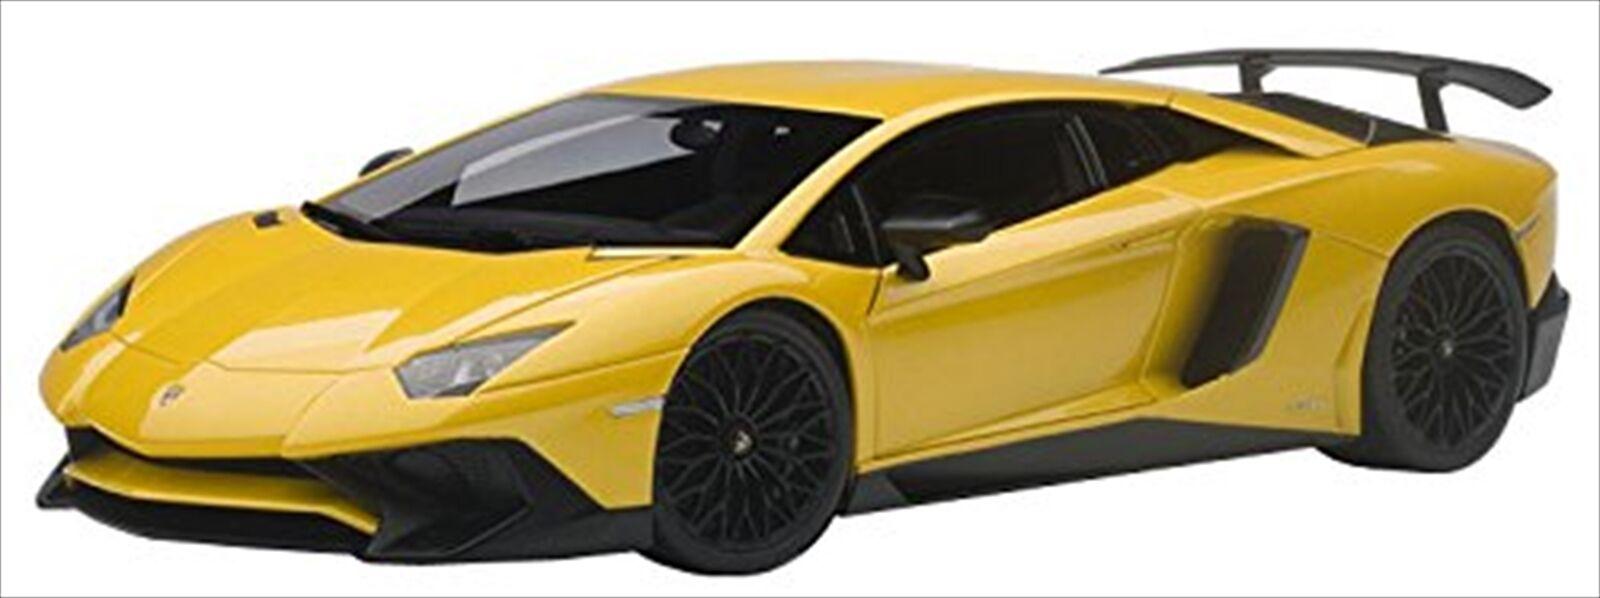 Autoart 1   18 Lamborghini Lamborghini Lamborghini aventandor lp750 - 4 SV Metal amarillo 74.558 35b